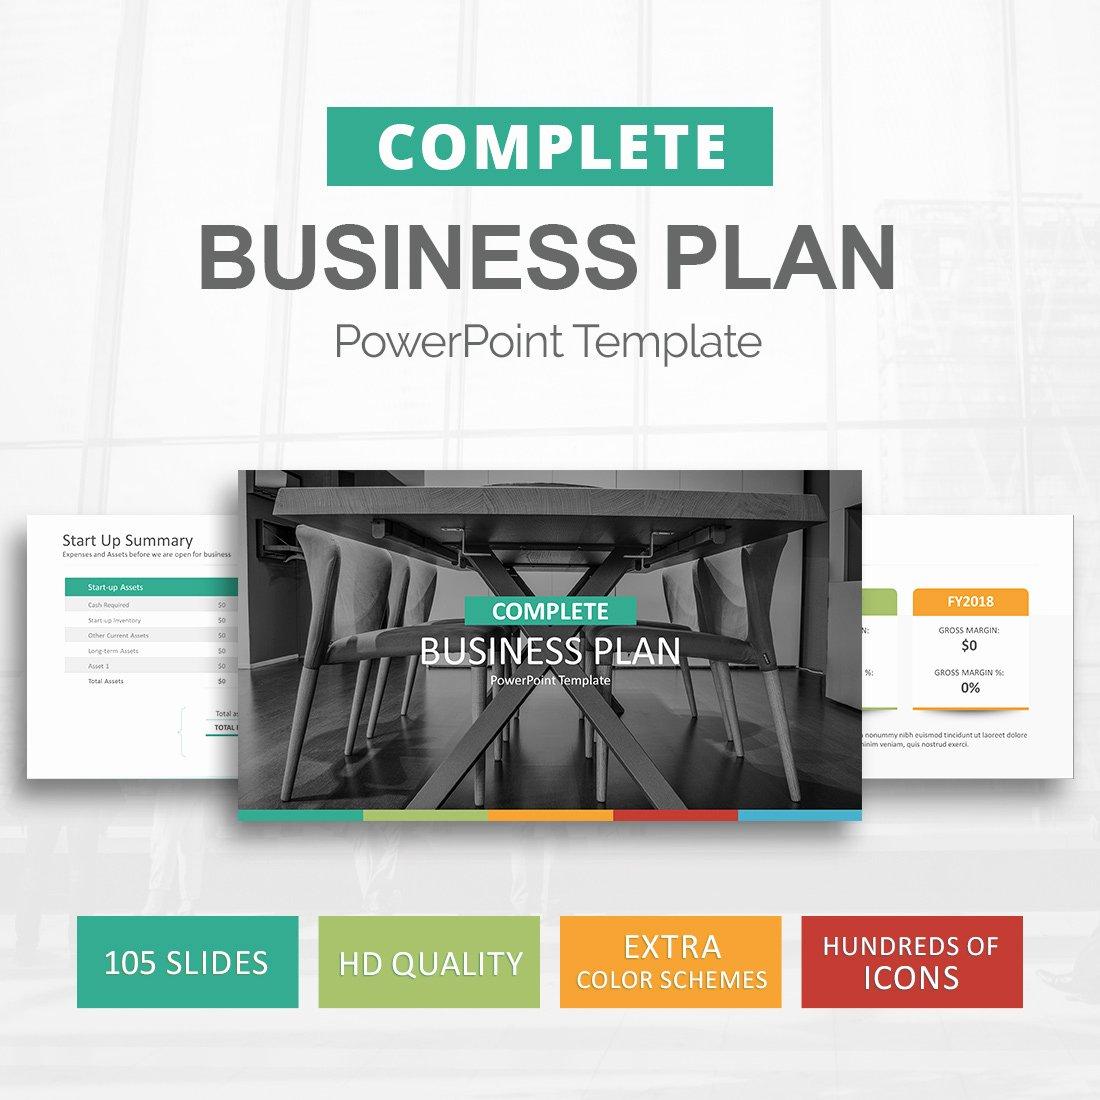 Business Plan Powerpoint Template Inspirational Business Plan Template for Powerpoint Slideson